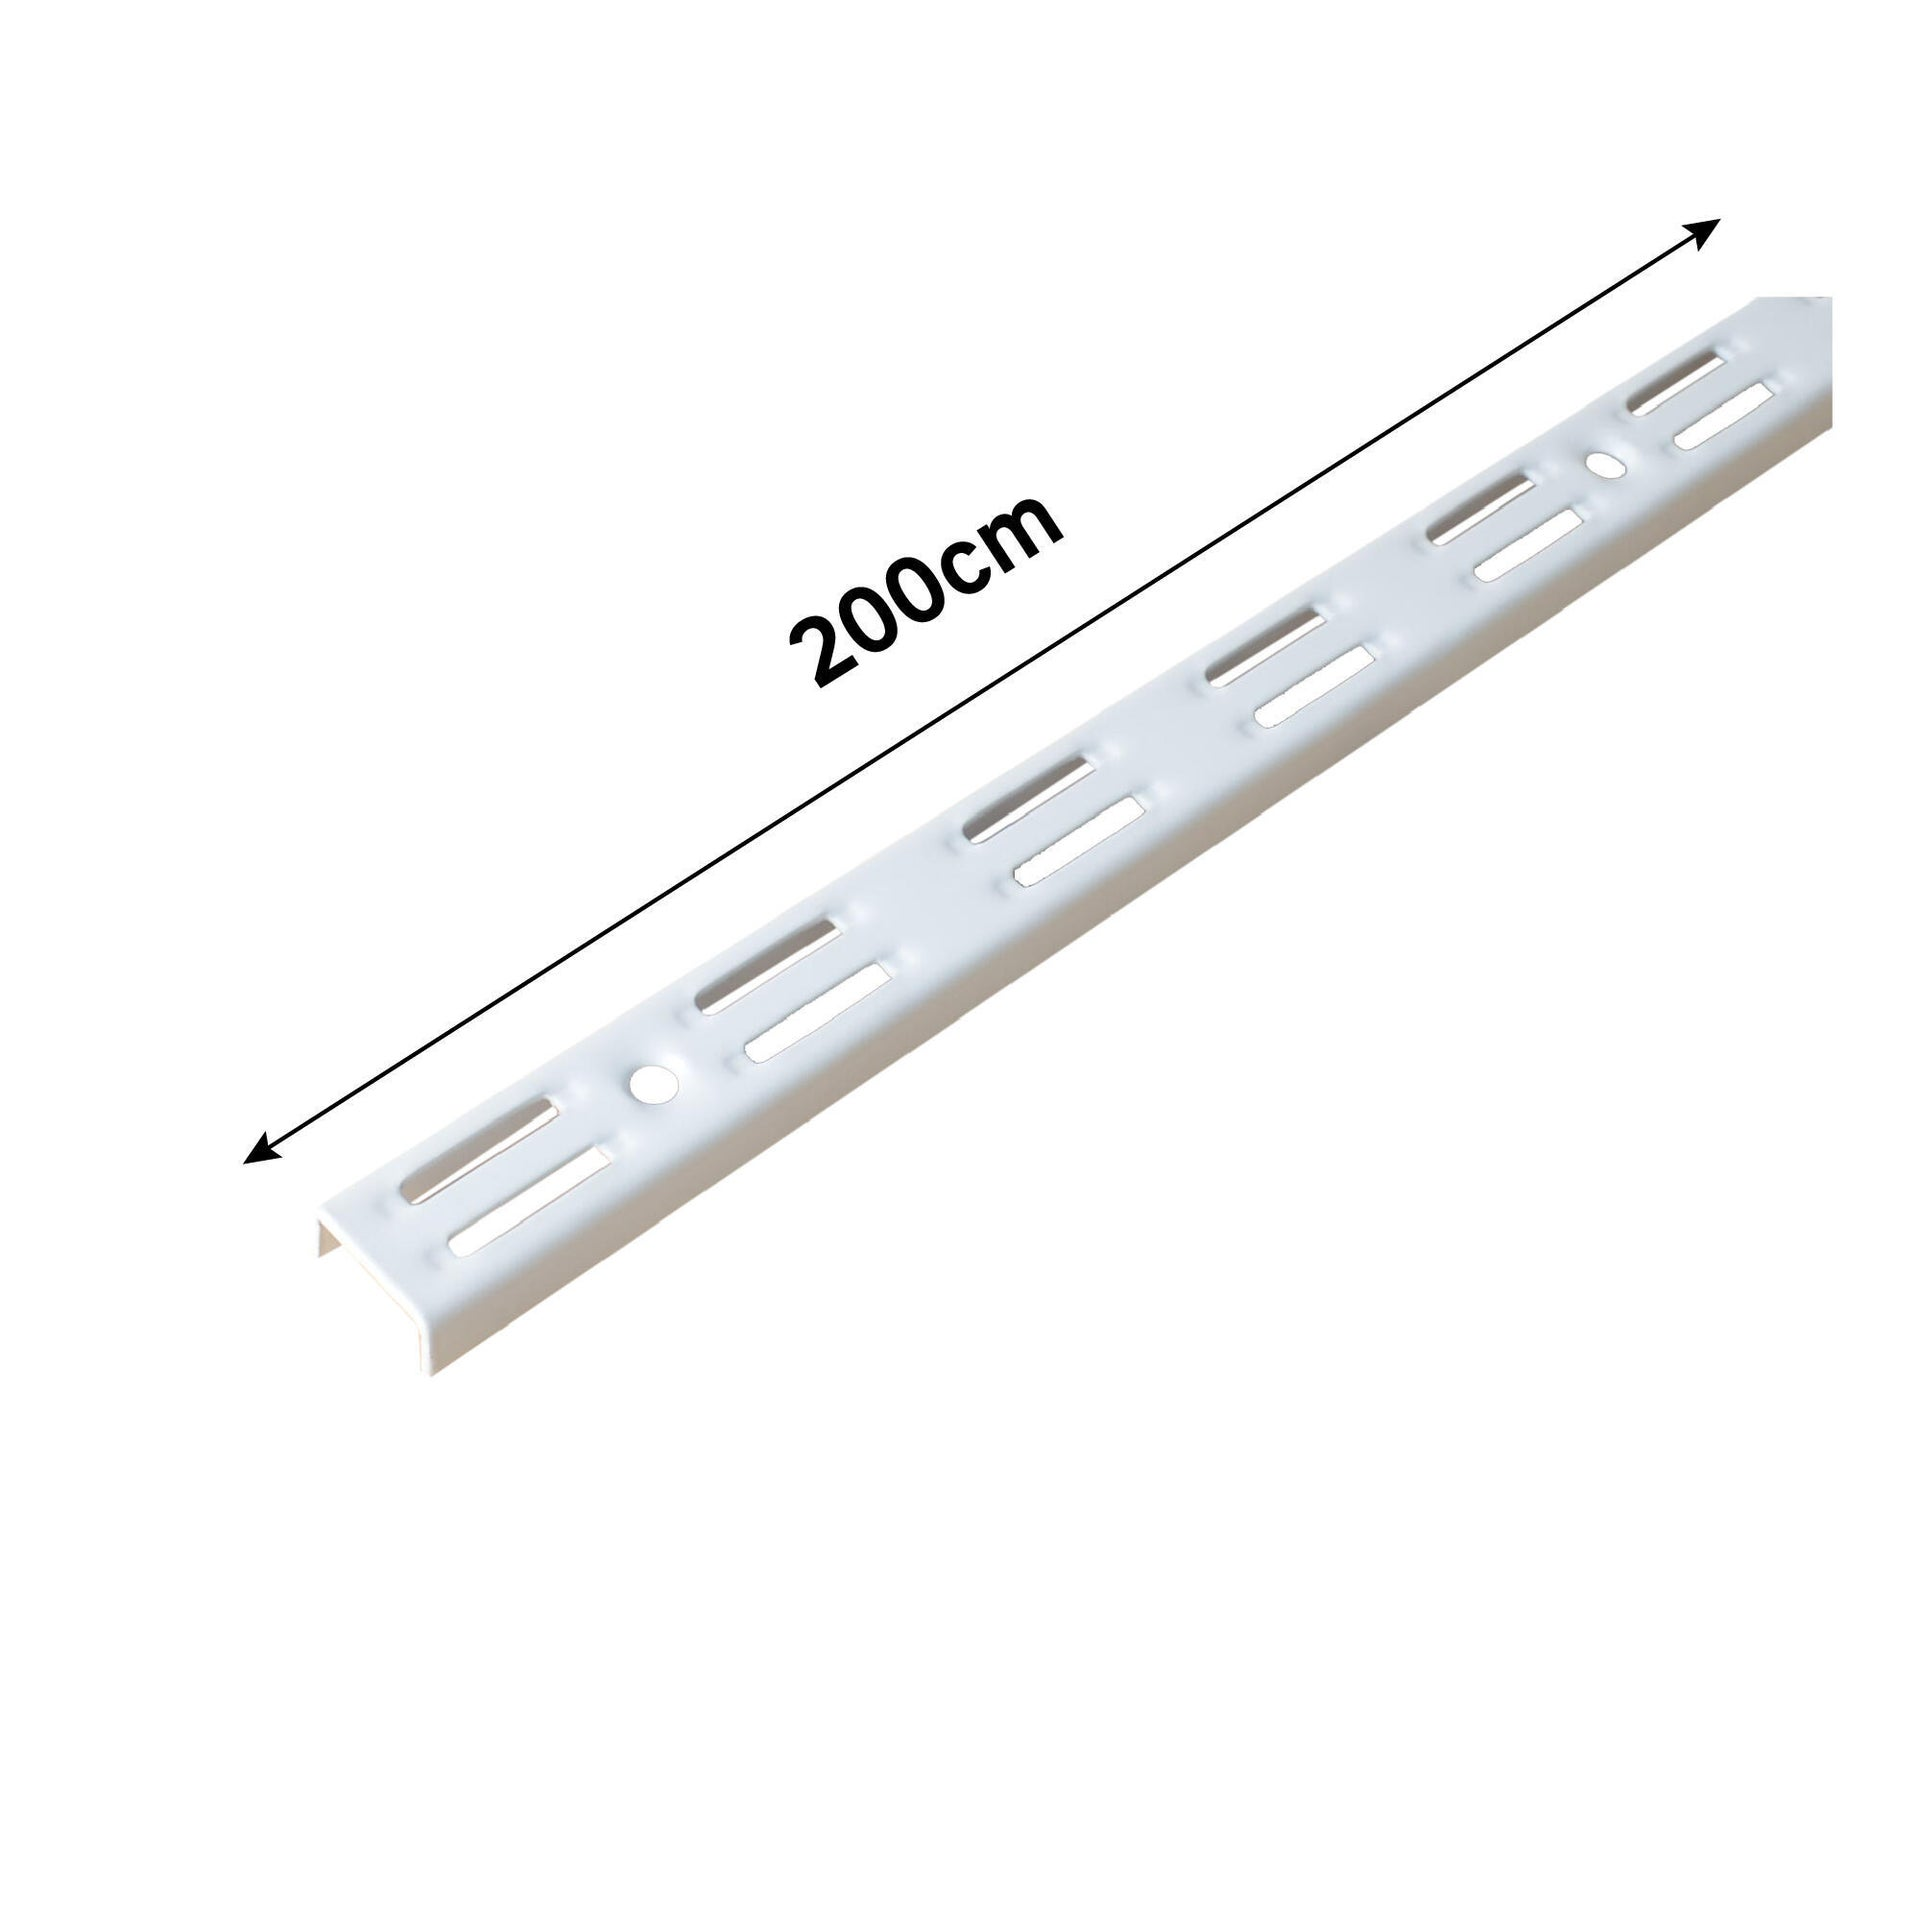 Cremagliera doppia Spaceo H 200 x L 0.25 cm, Sp 1.5 mm bianco - 35